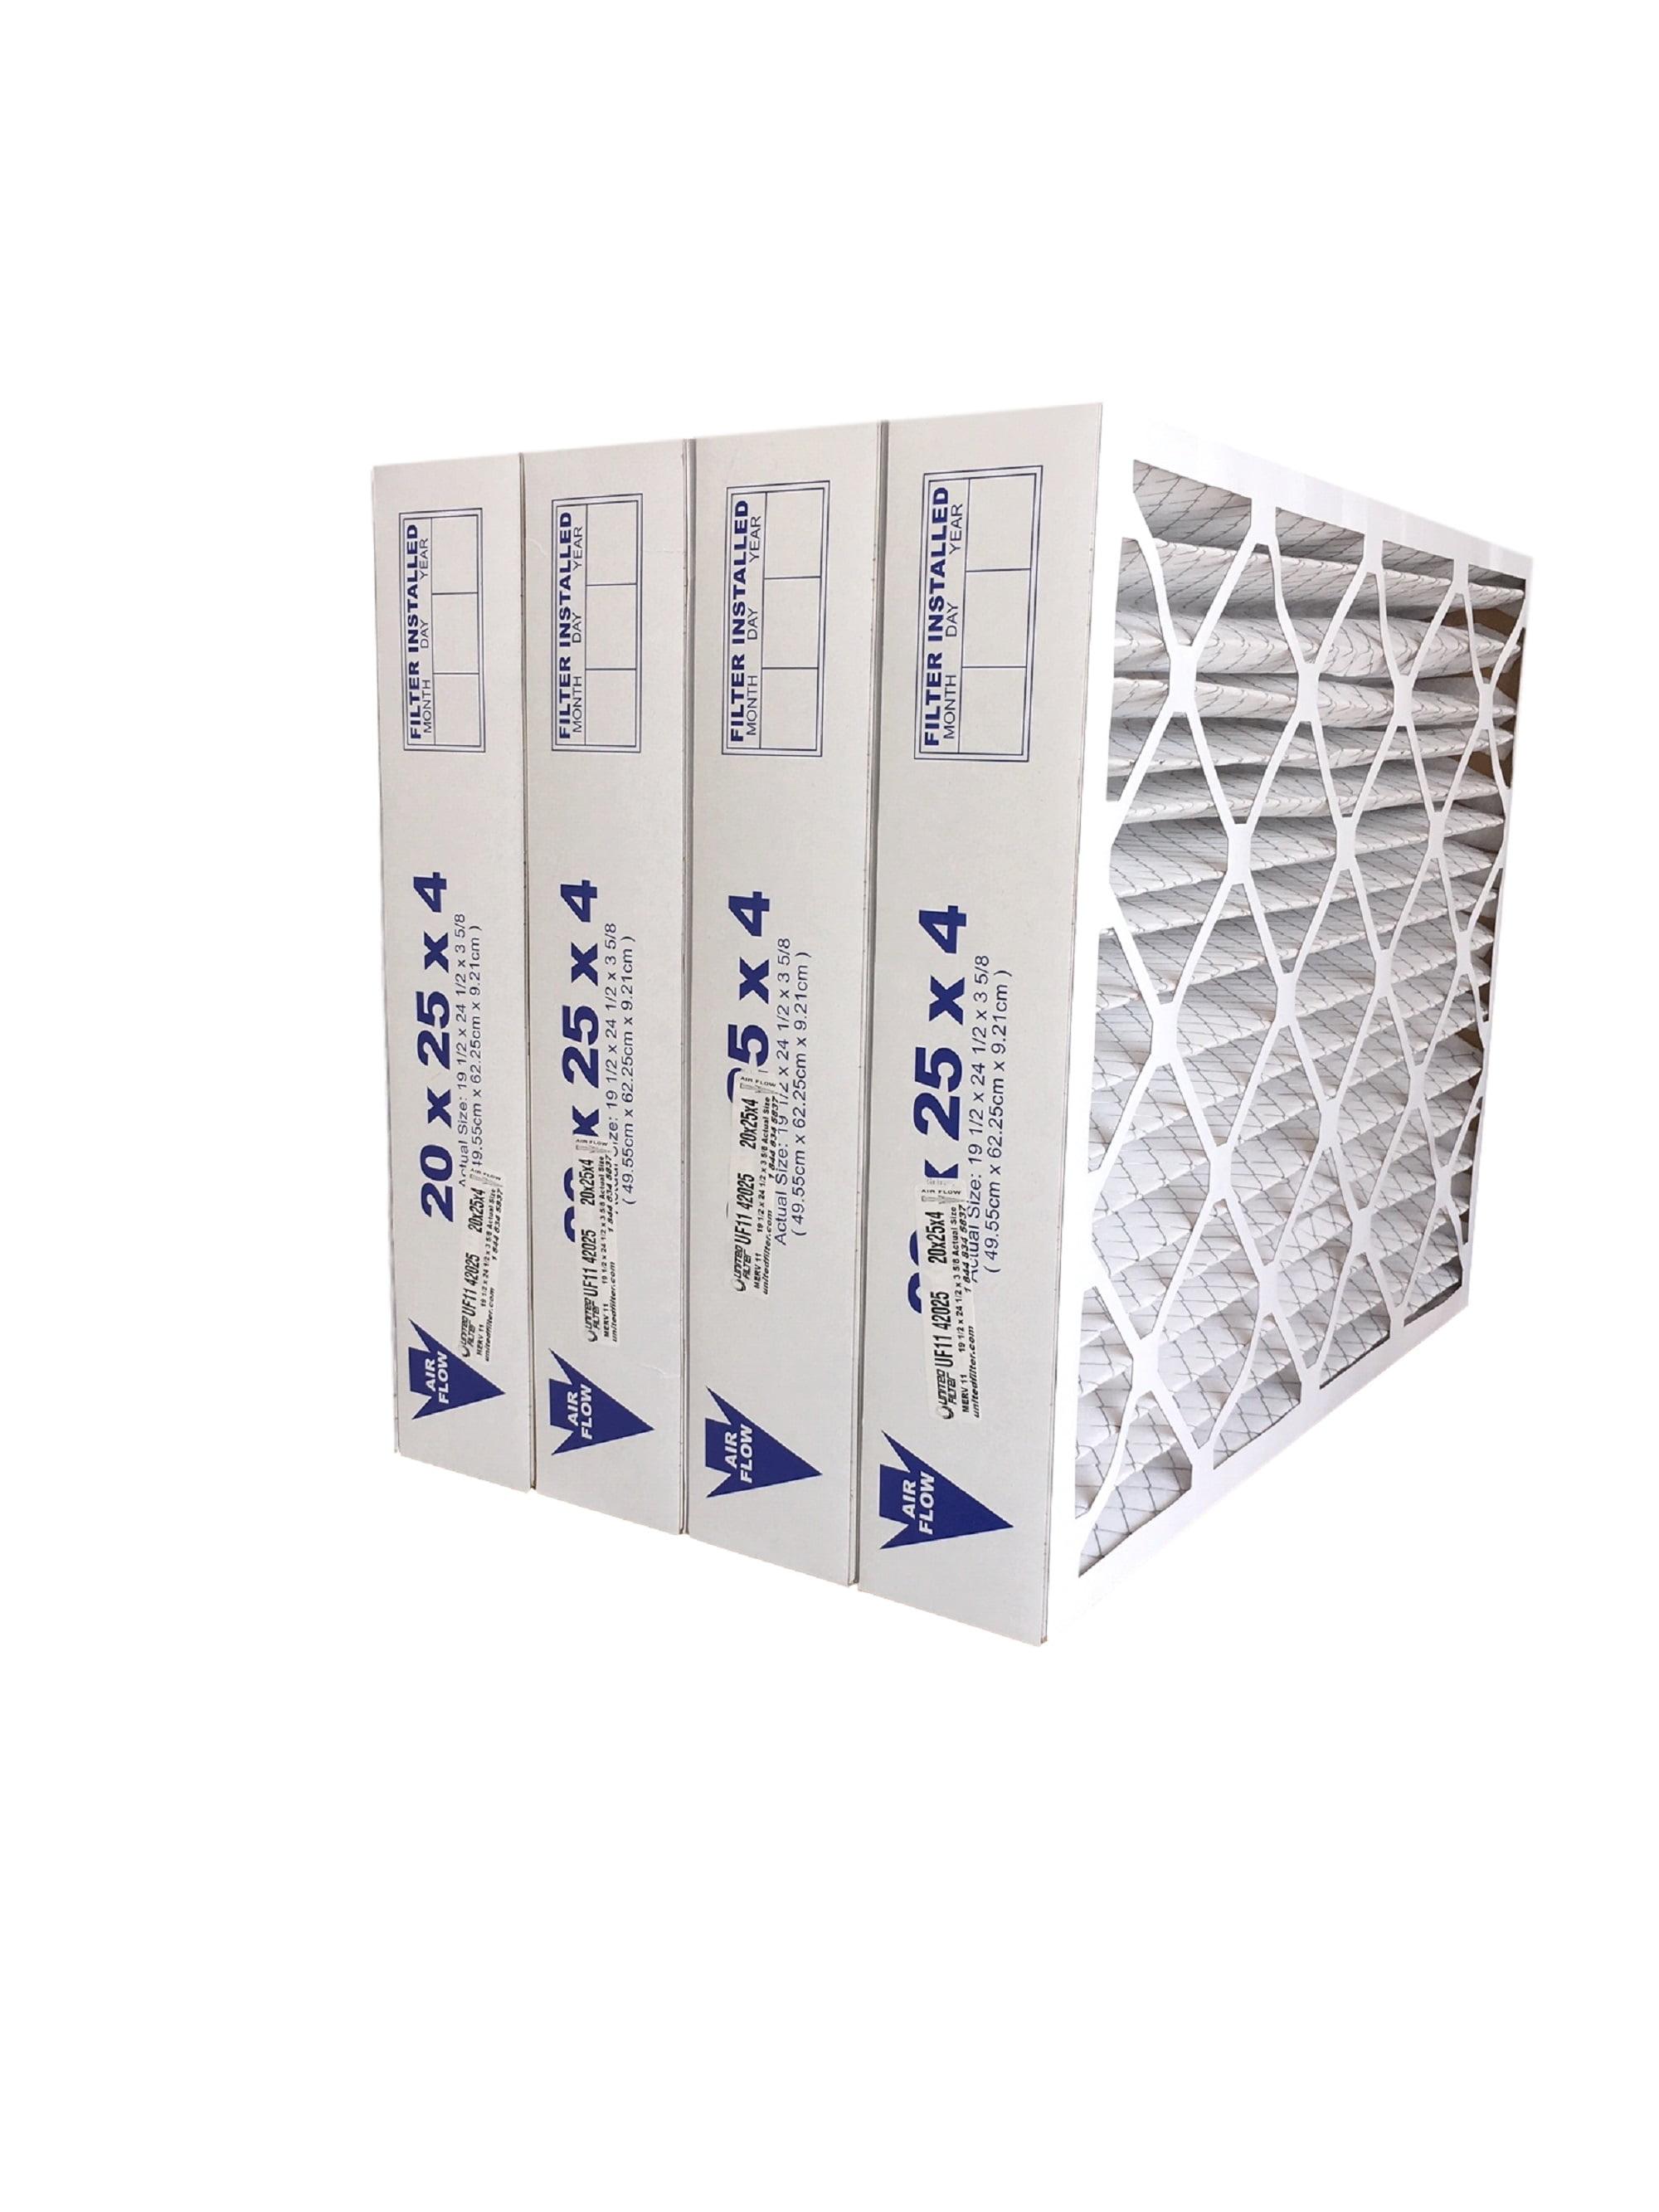 6 Pack 16 x 20 x 4 Merv 11 Furnace Filter